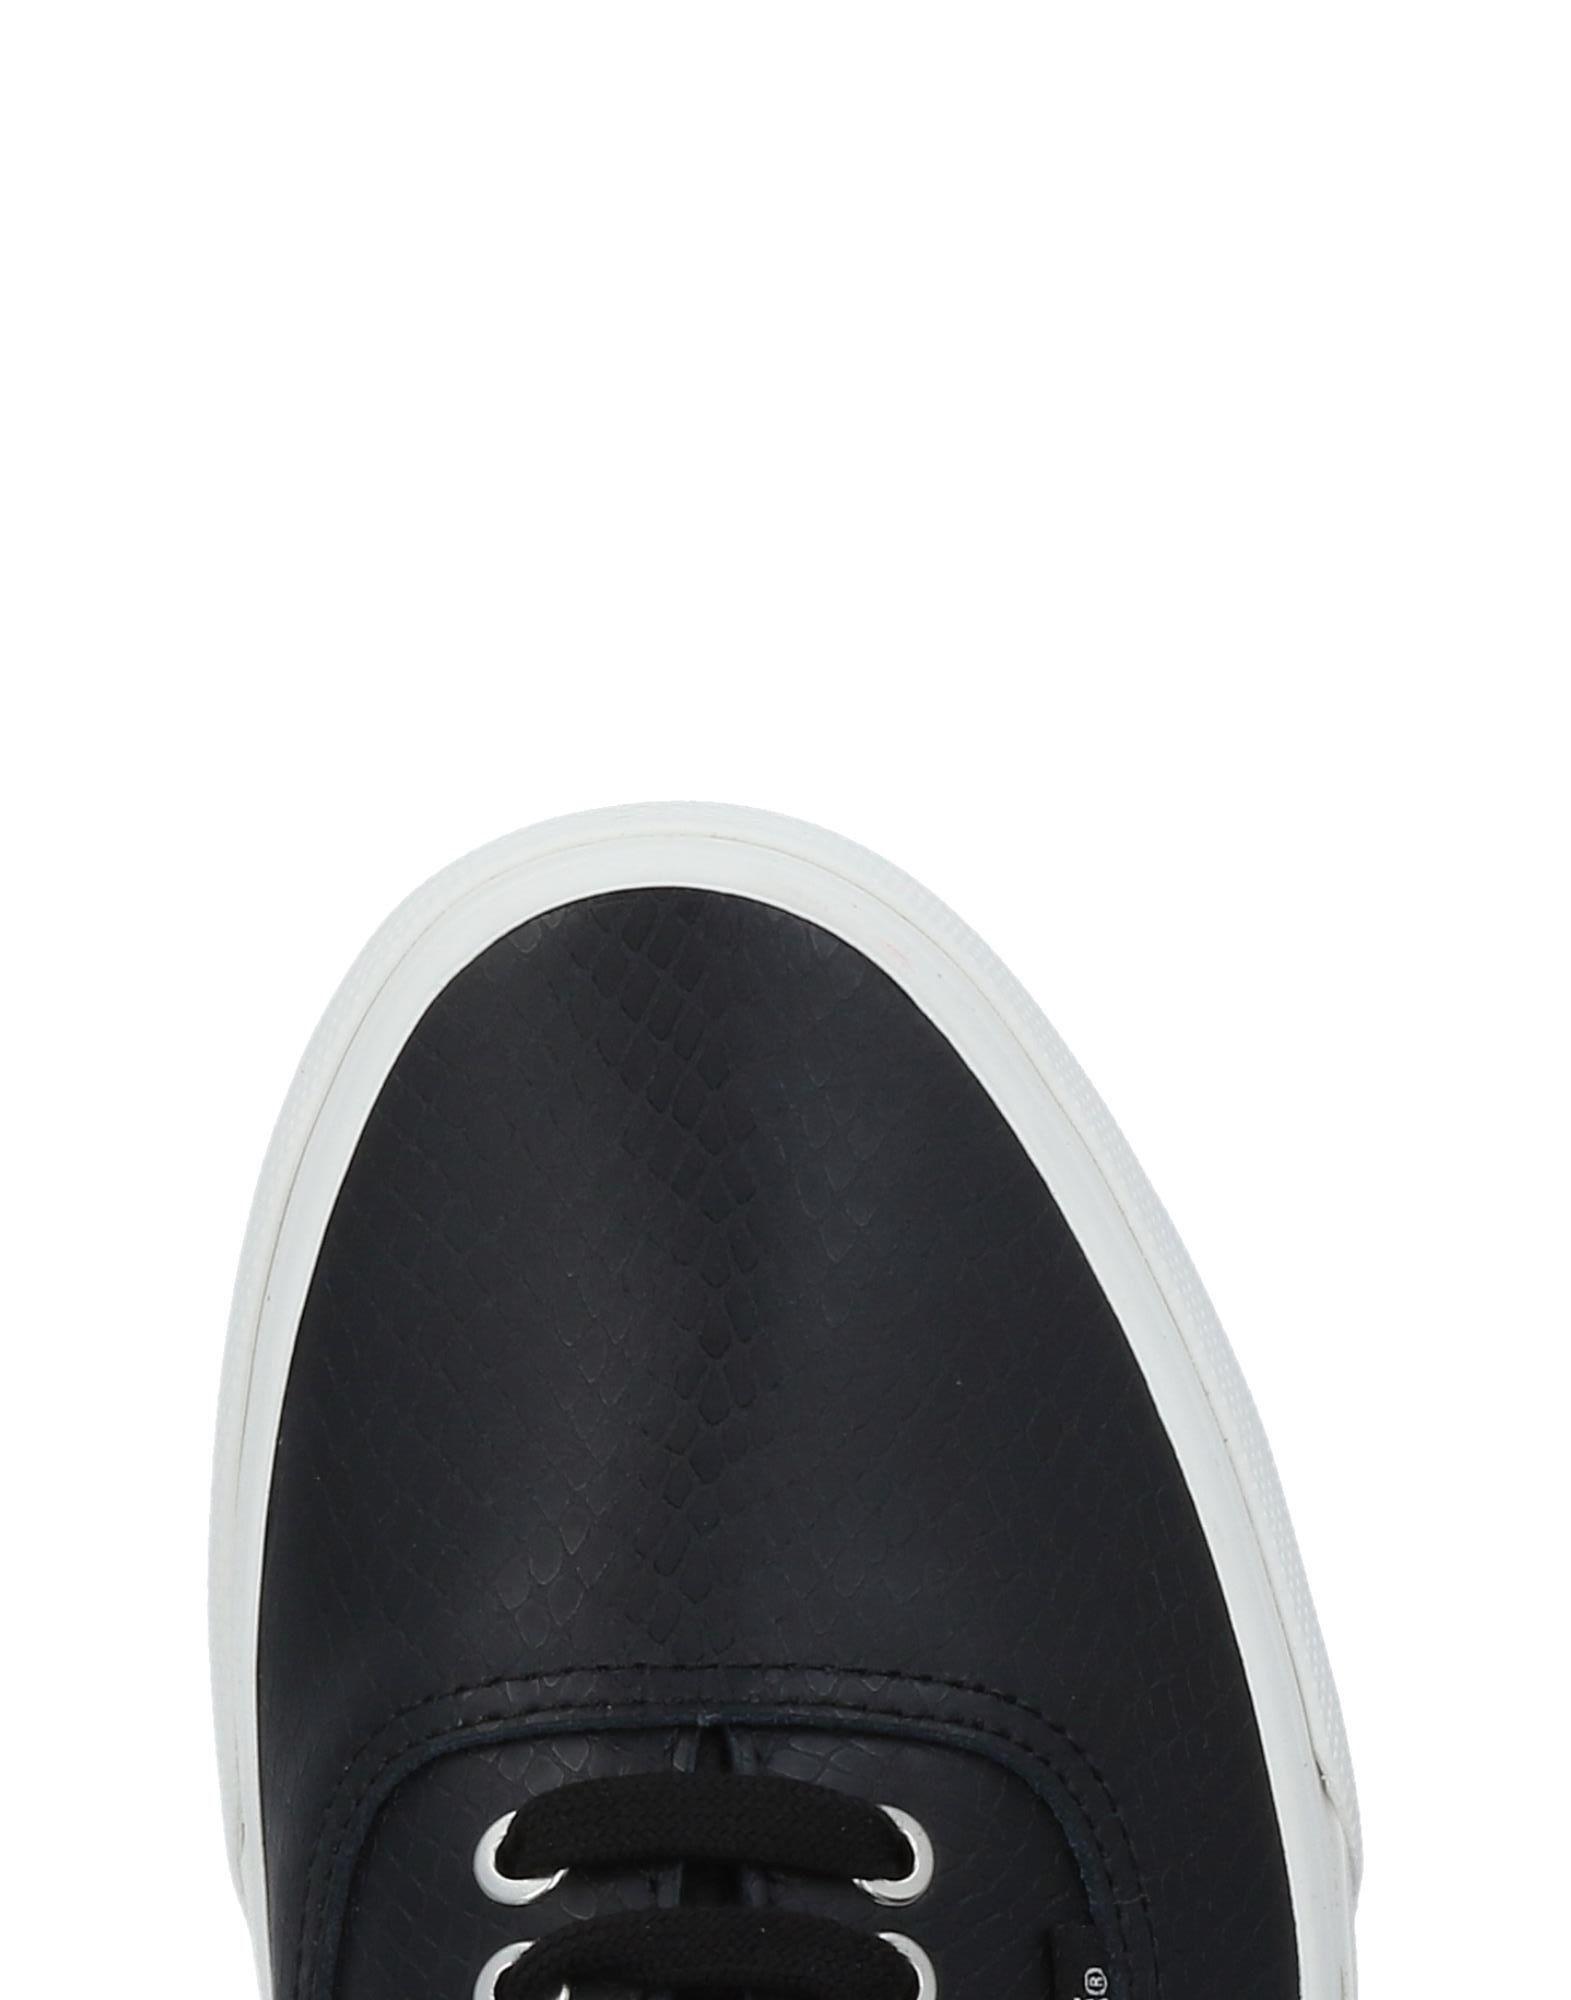 Vans Sneakers Gute Damen  11478038NJ Gute Sneakers Qualität beliebte Schuhe a76f64